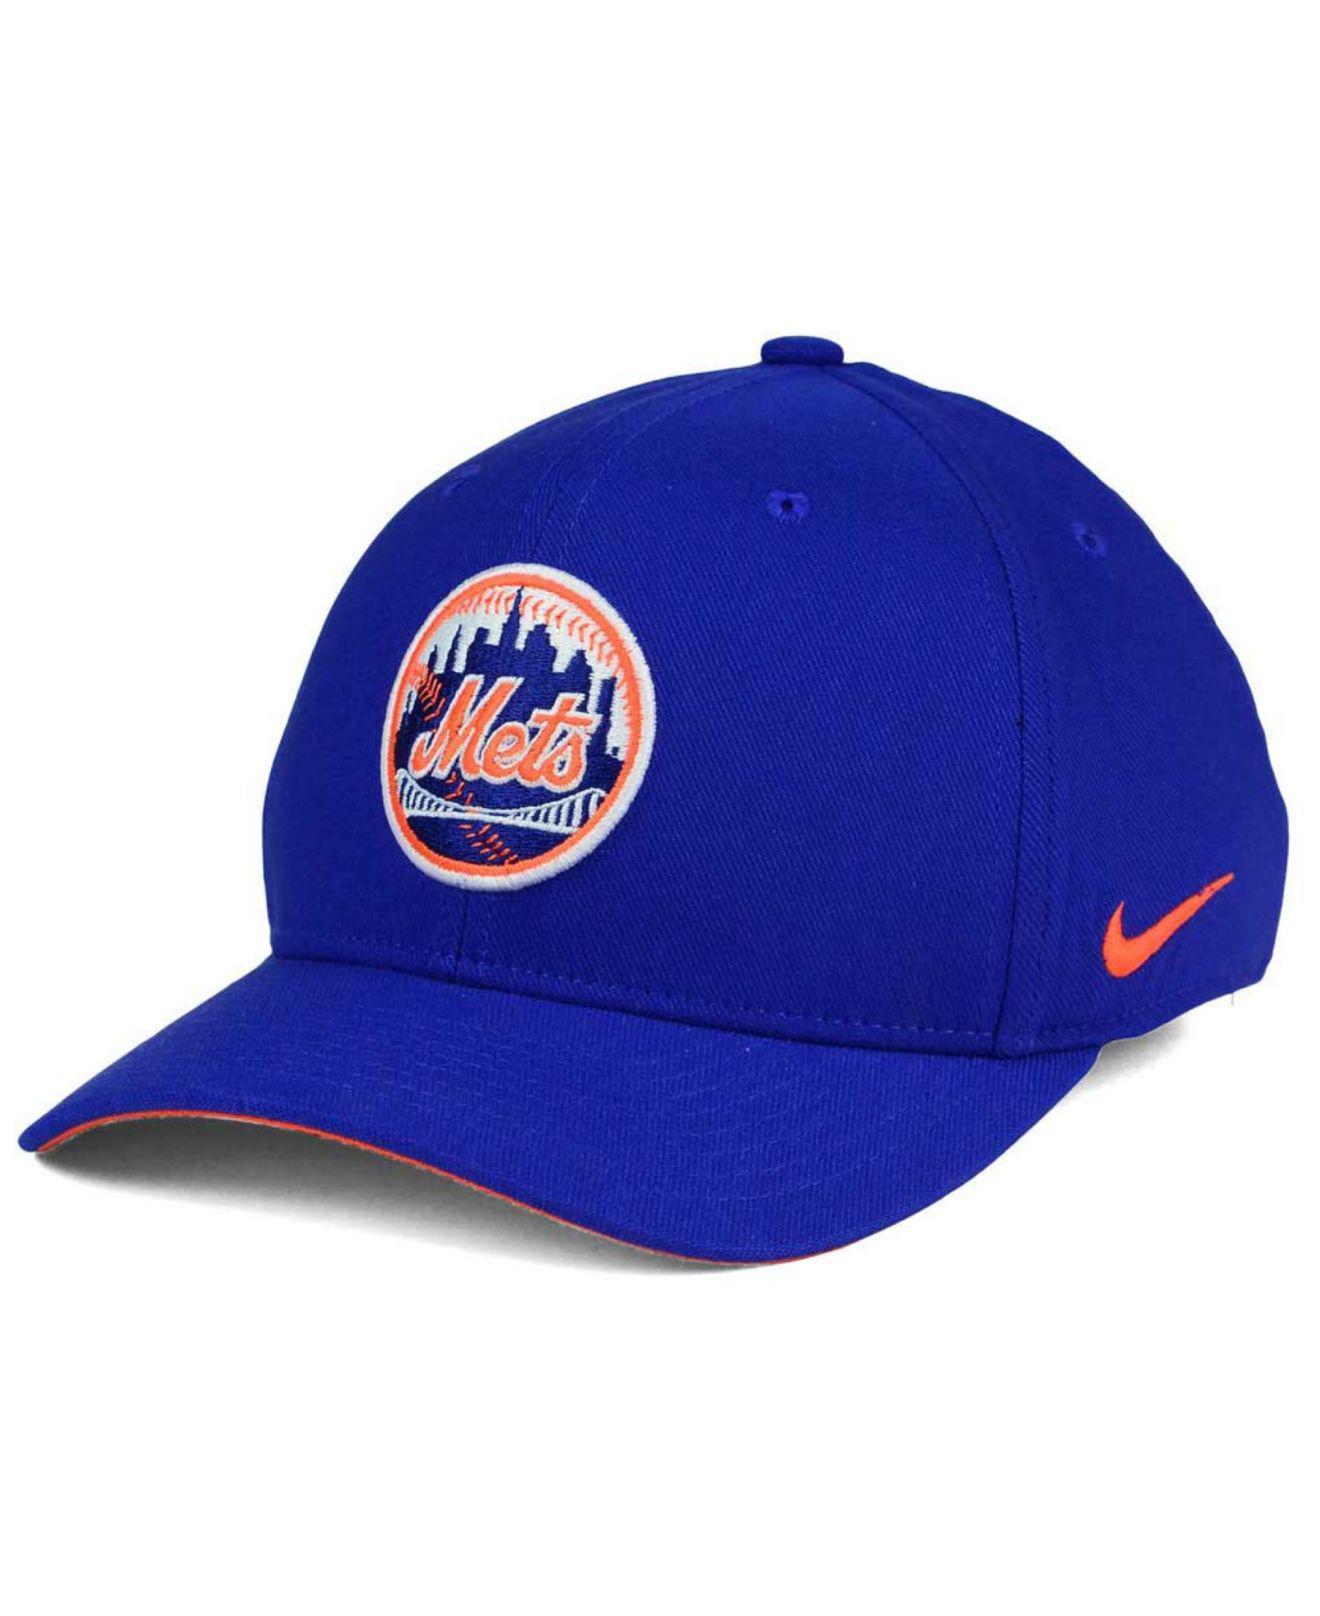 huge discount 2732f 796b7 Nike. Men s Blue New York Mets Ligature Swoosh Flex Cap